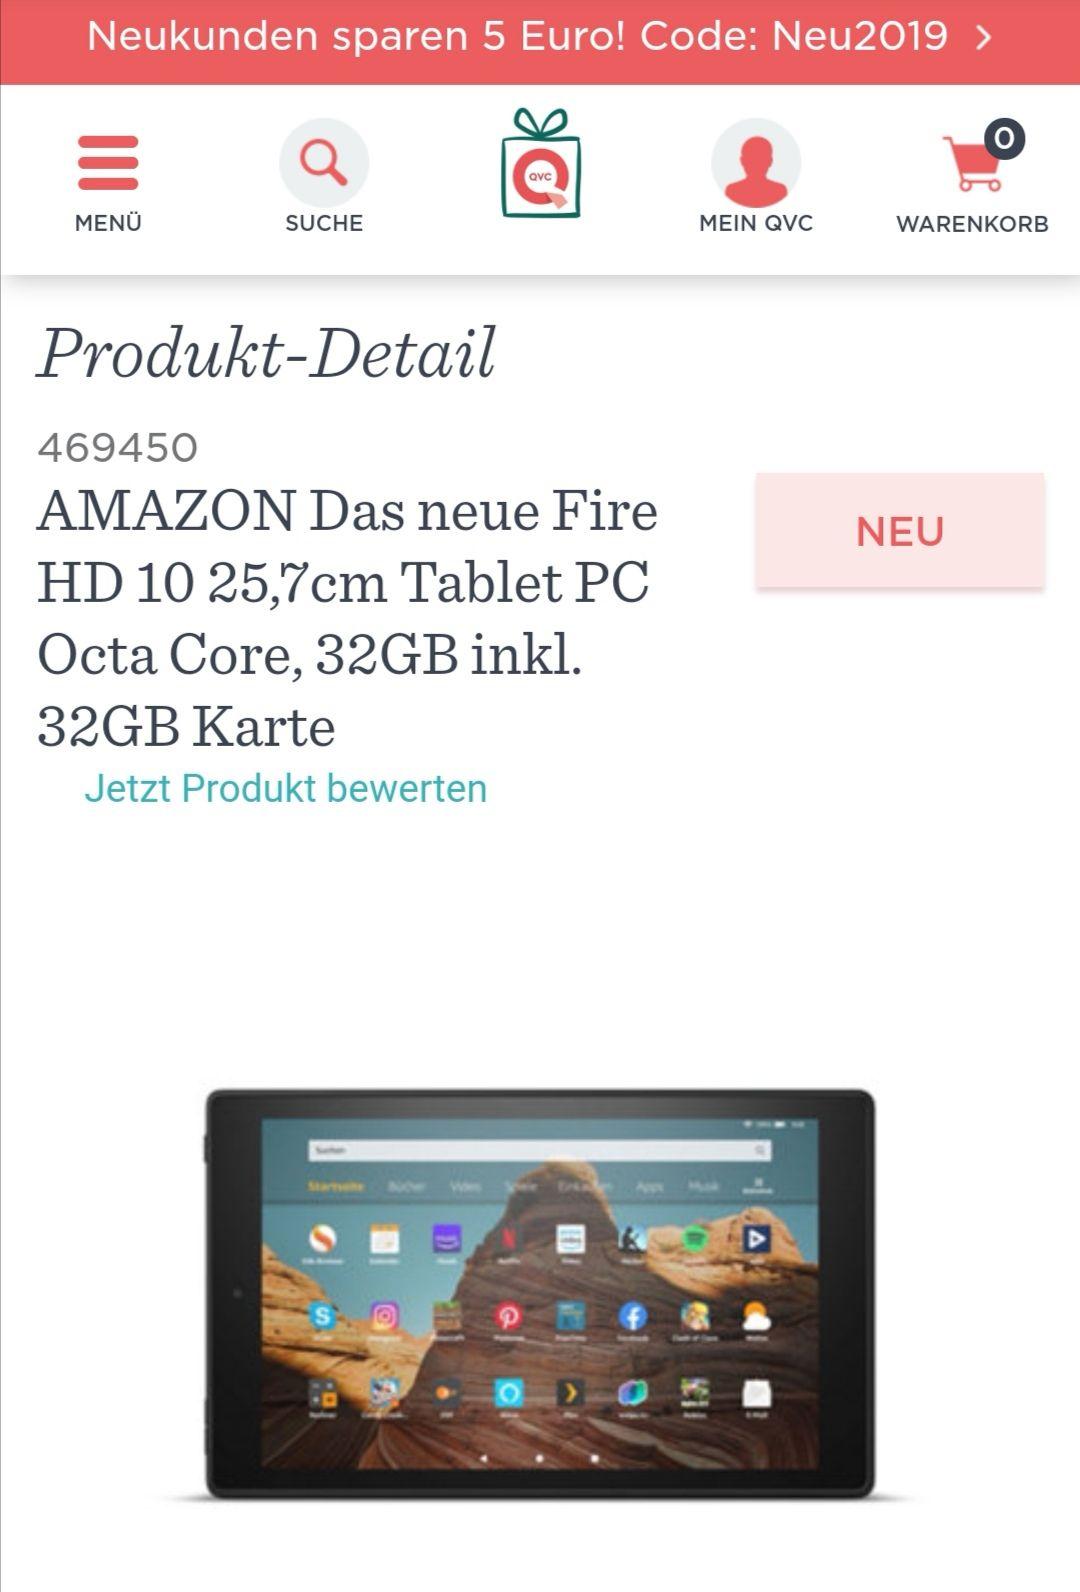 [QVC] AMAZON Das neue Fire HD 10 25,7cm Tablet PC Octa Core, 32GB inkl. 32GB Karte